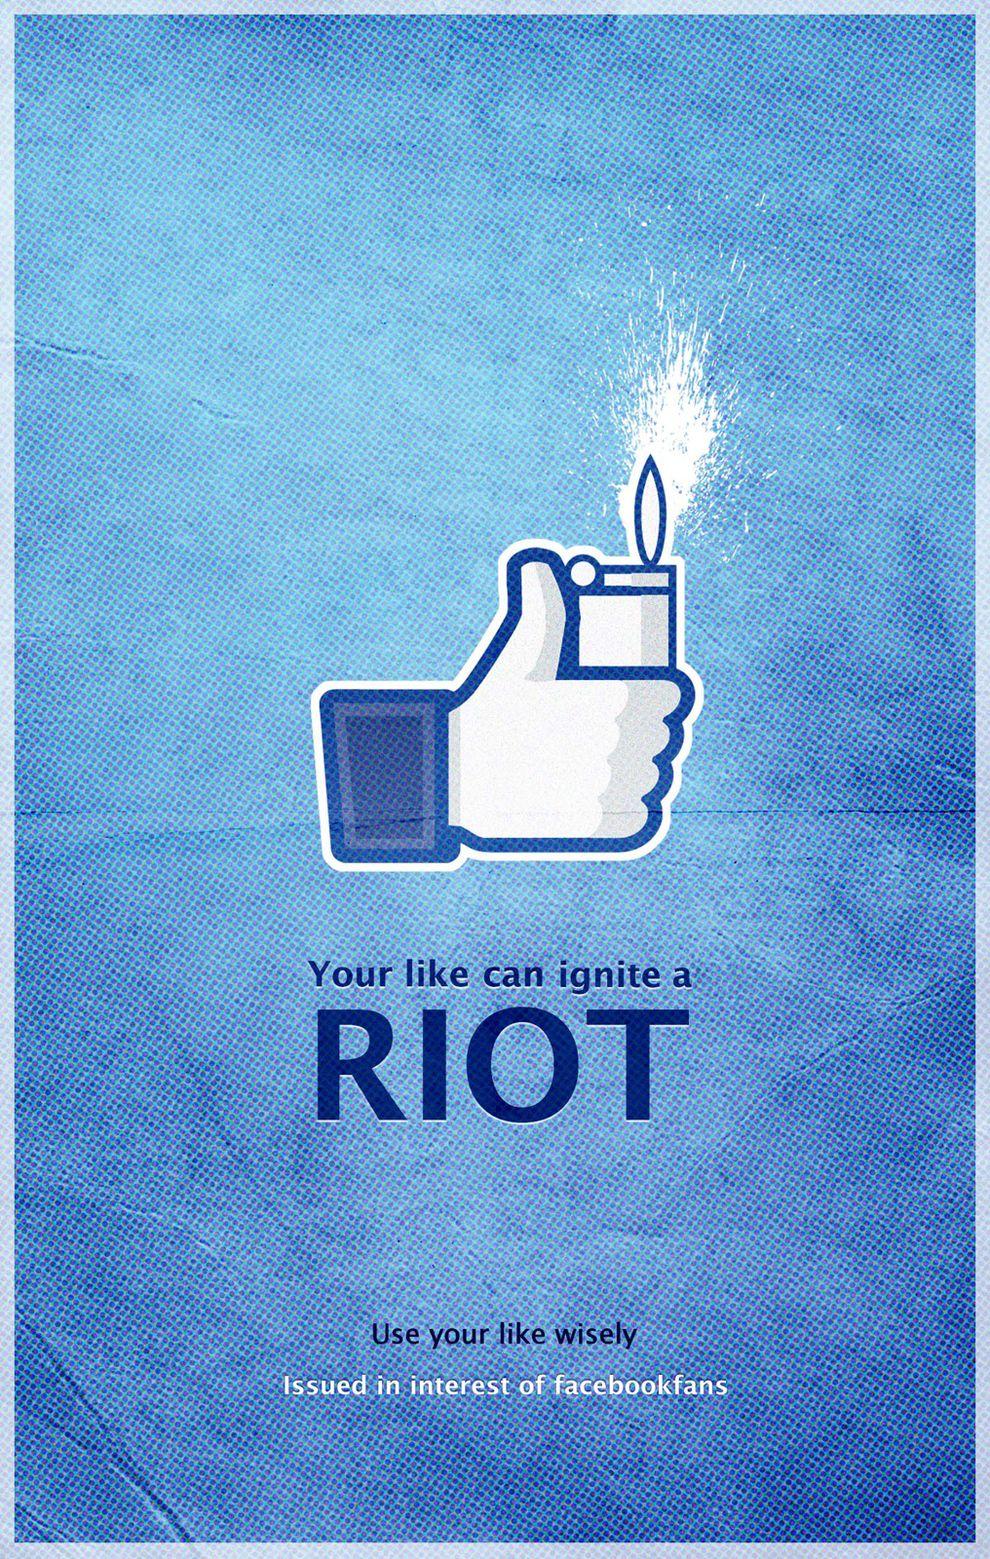 New Facebook PSA Campaign   Marketing/Design   Pinterest   Creative ...